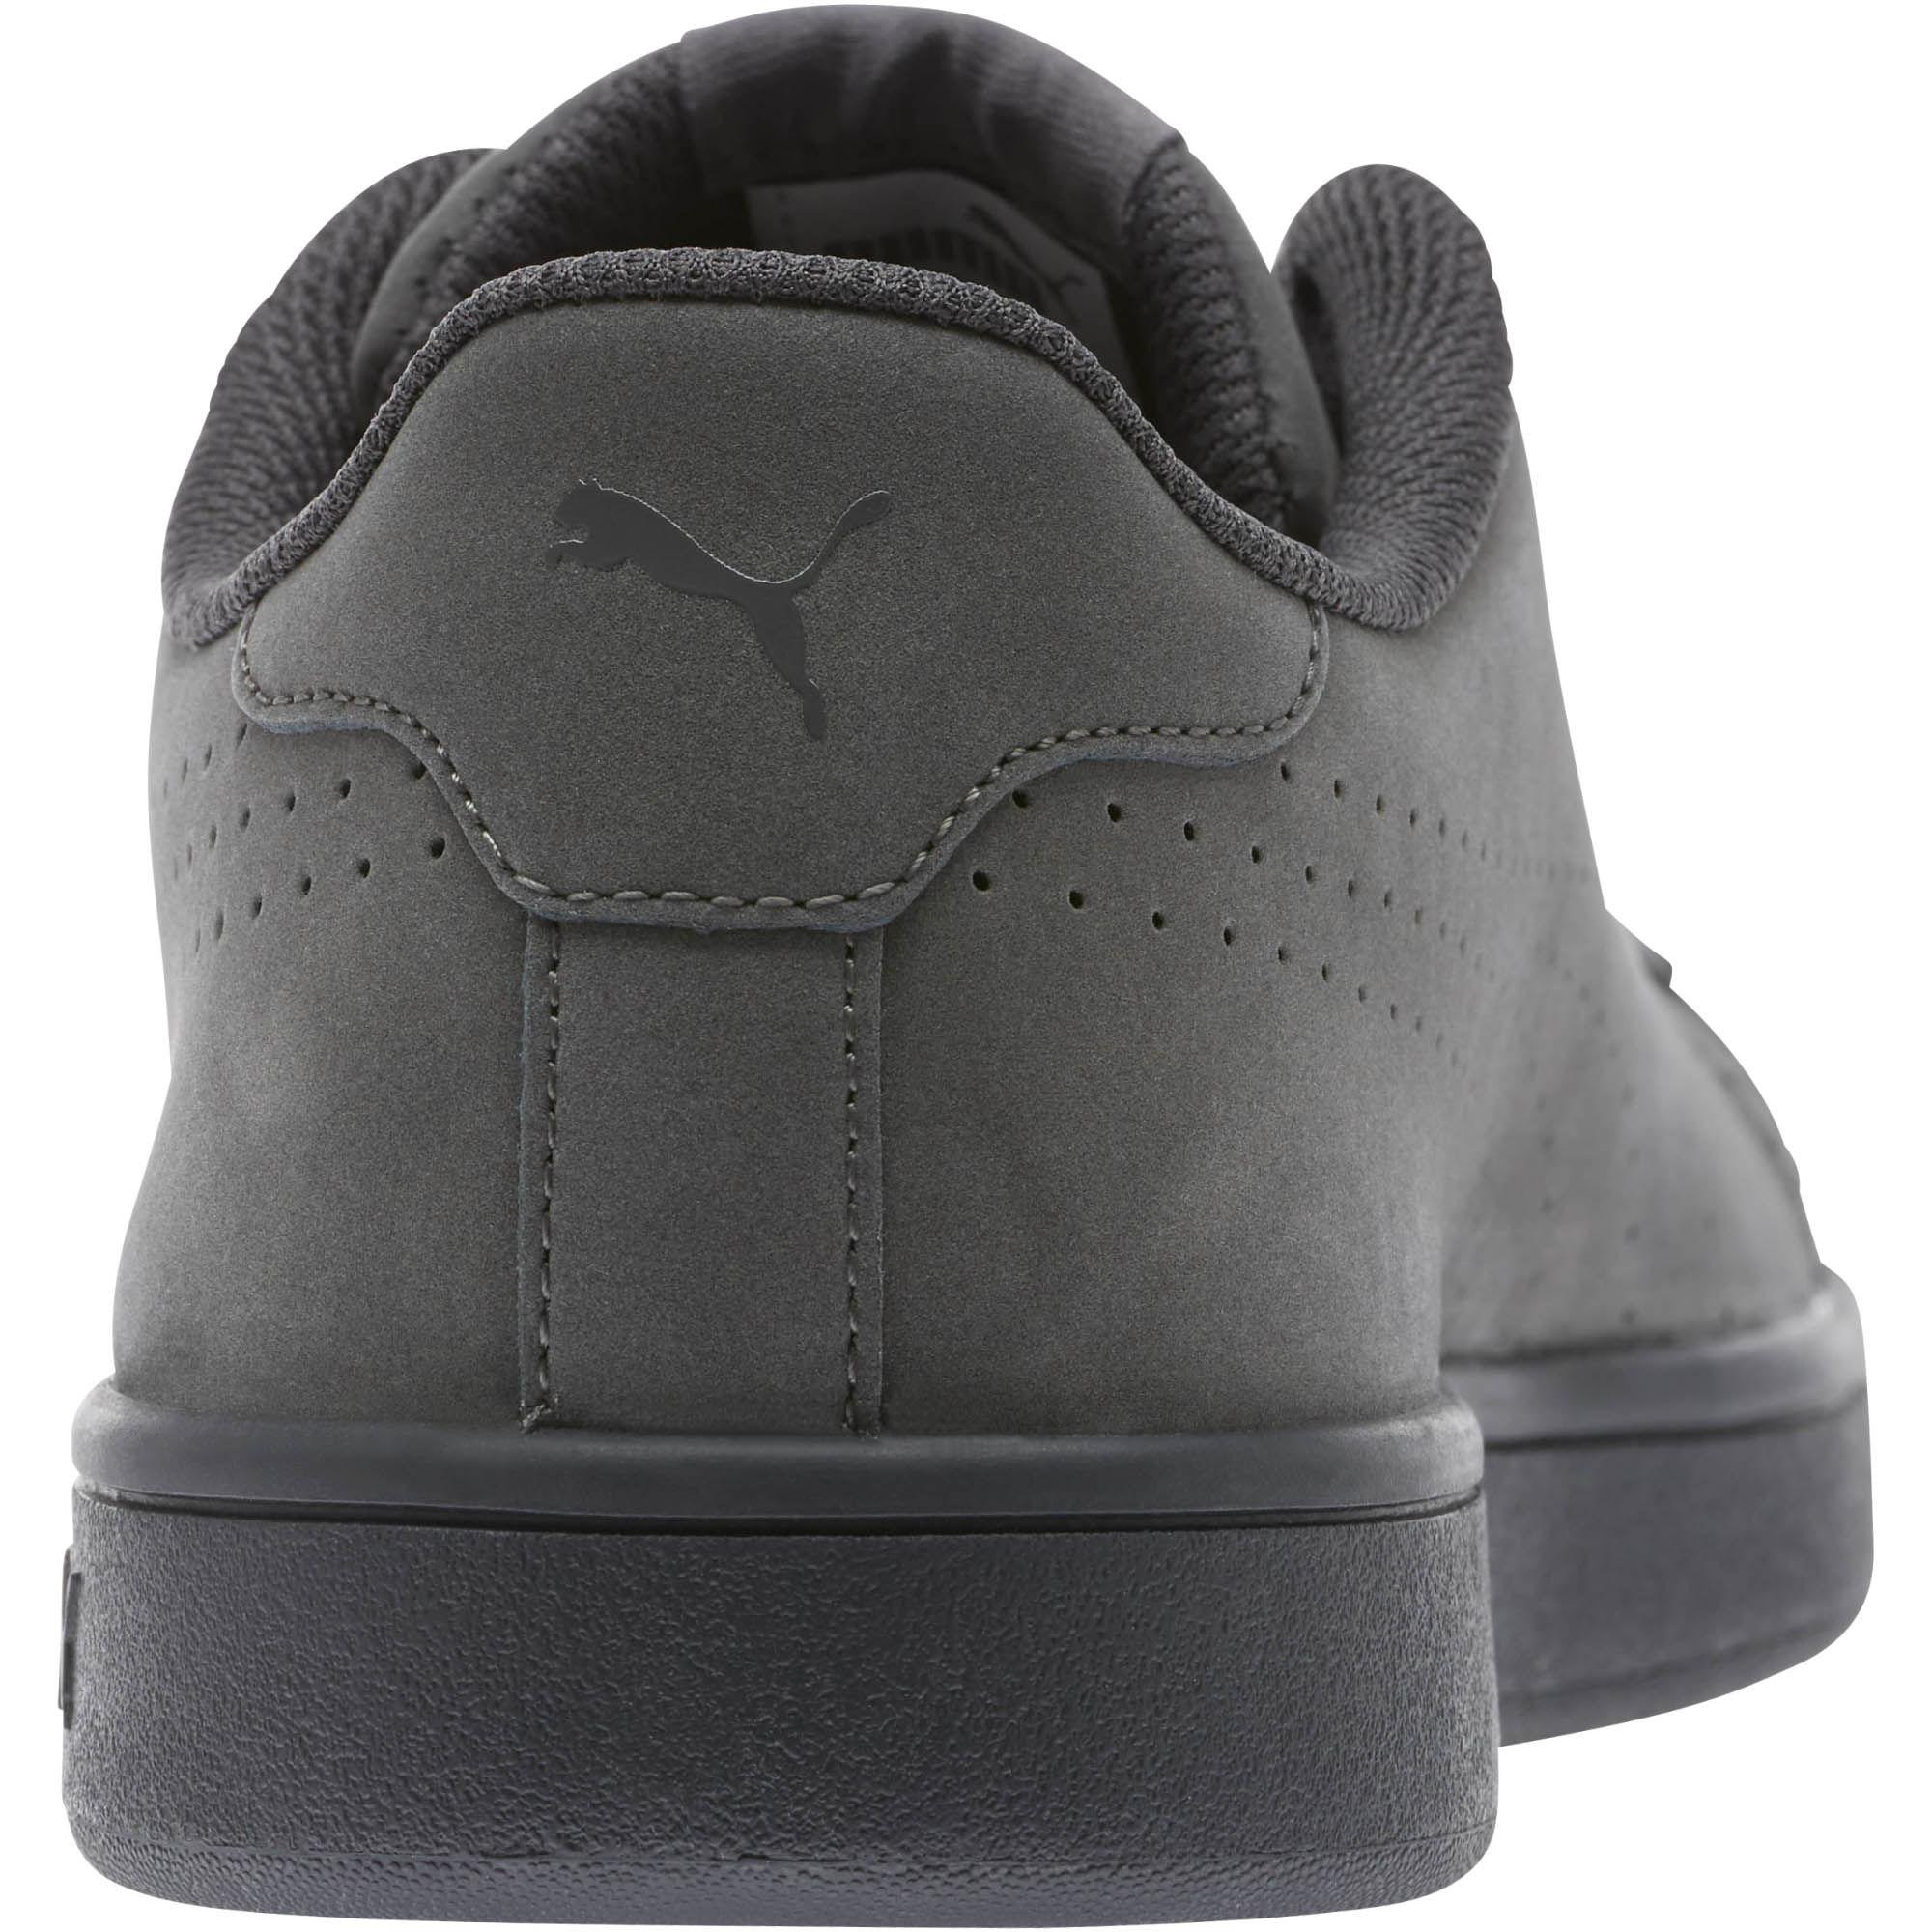 Lyst - PUMA Smash V2 Nubuck Men s Sneakers in Black for Men 6d05814f9